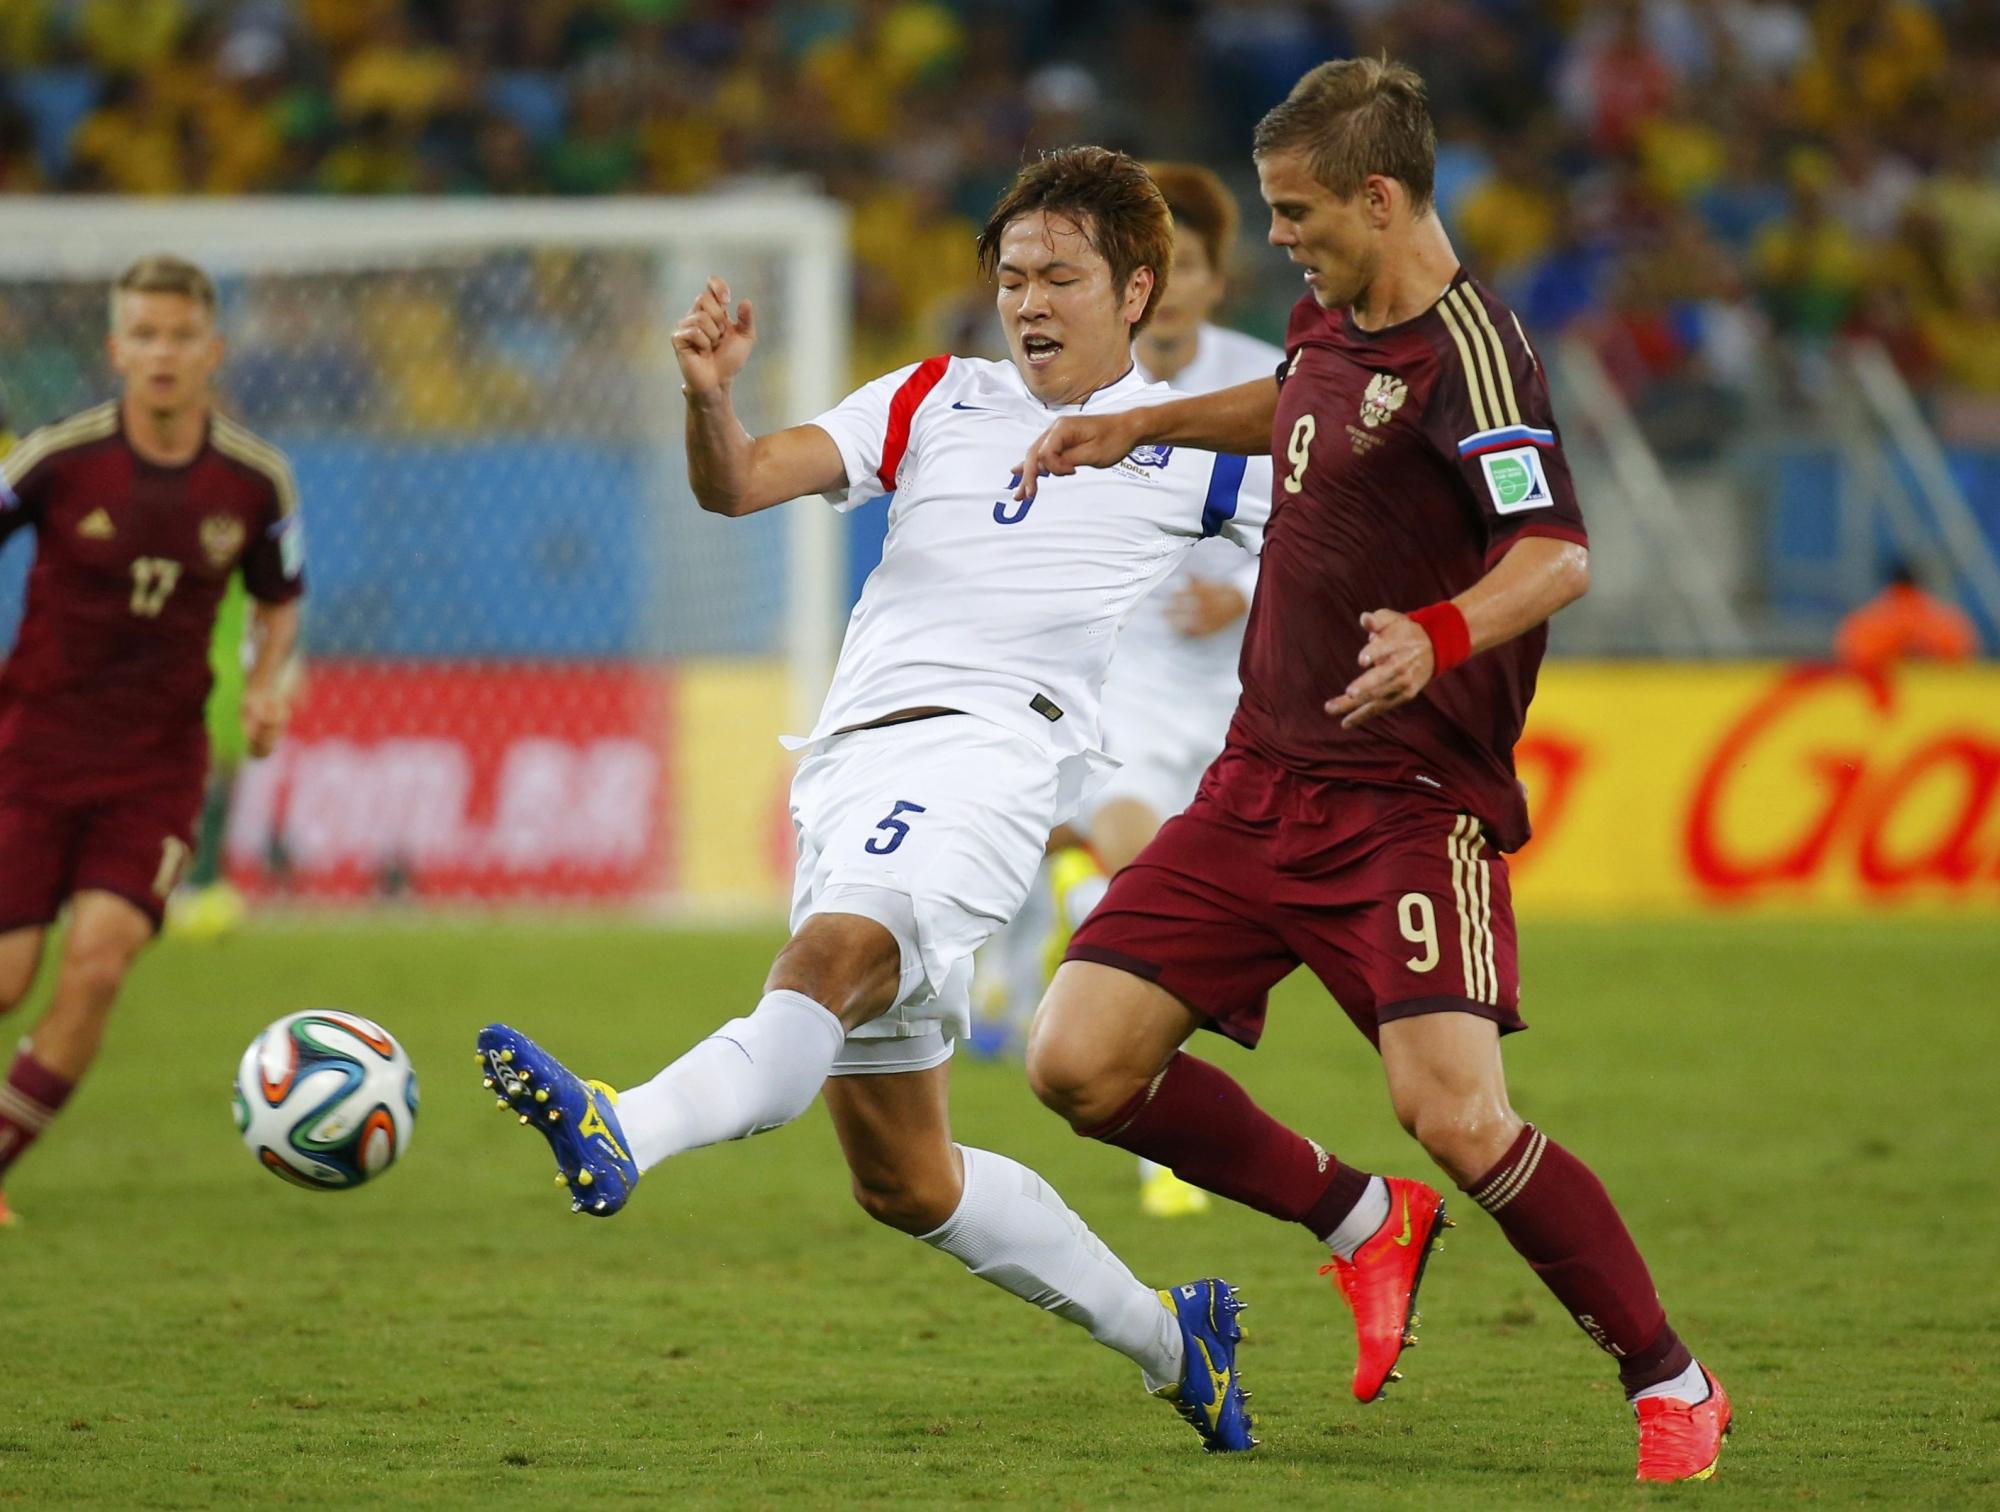 чемпионат мира по футболу 2014 россия и корея